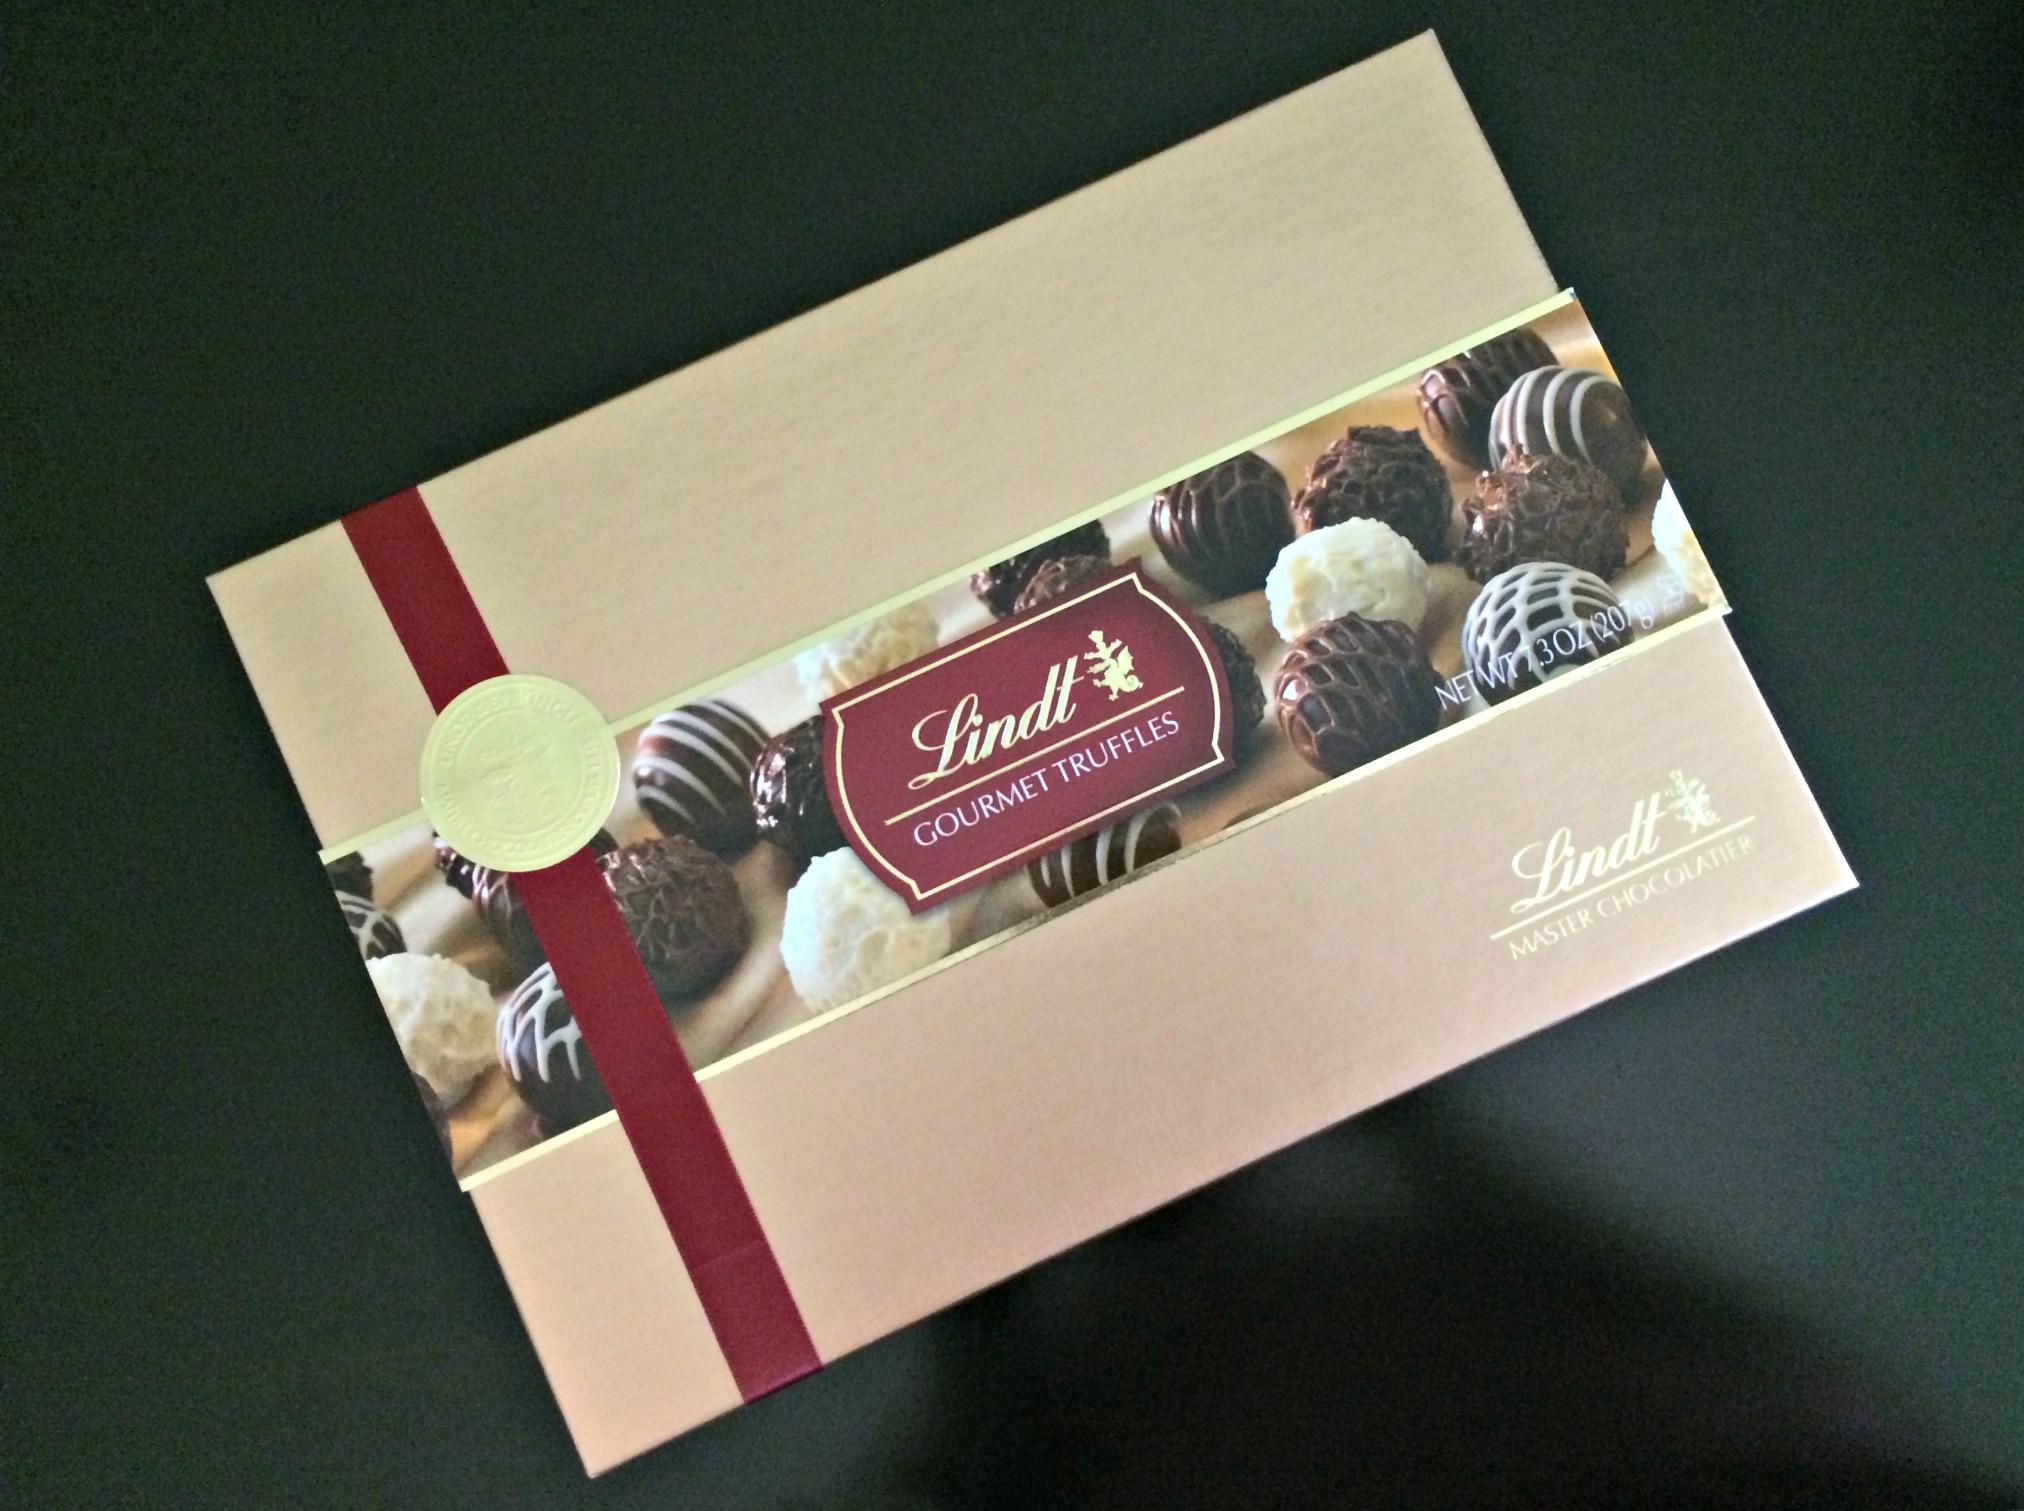 Lindt gourmet truffles